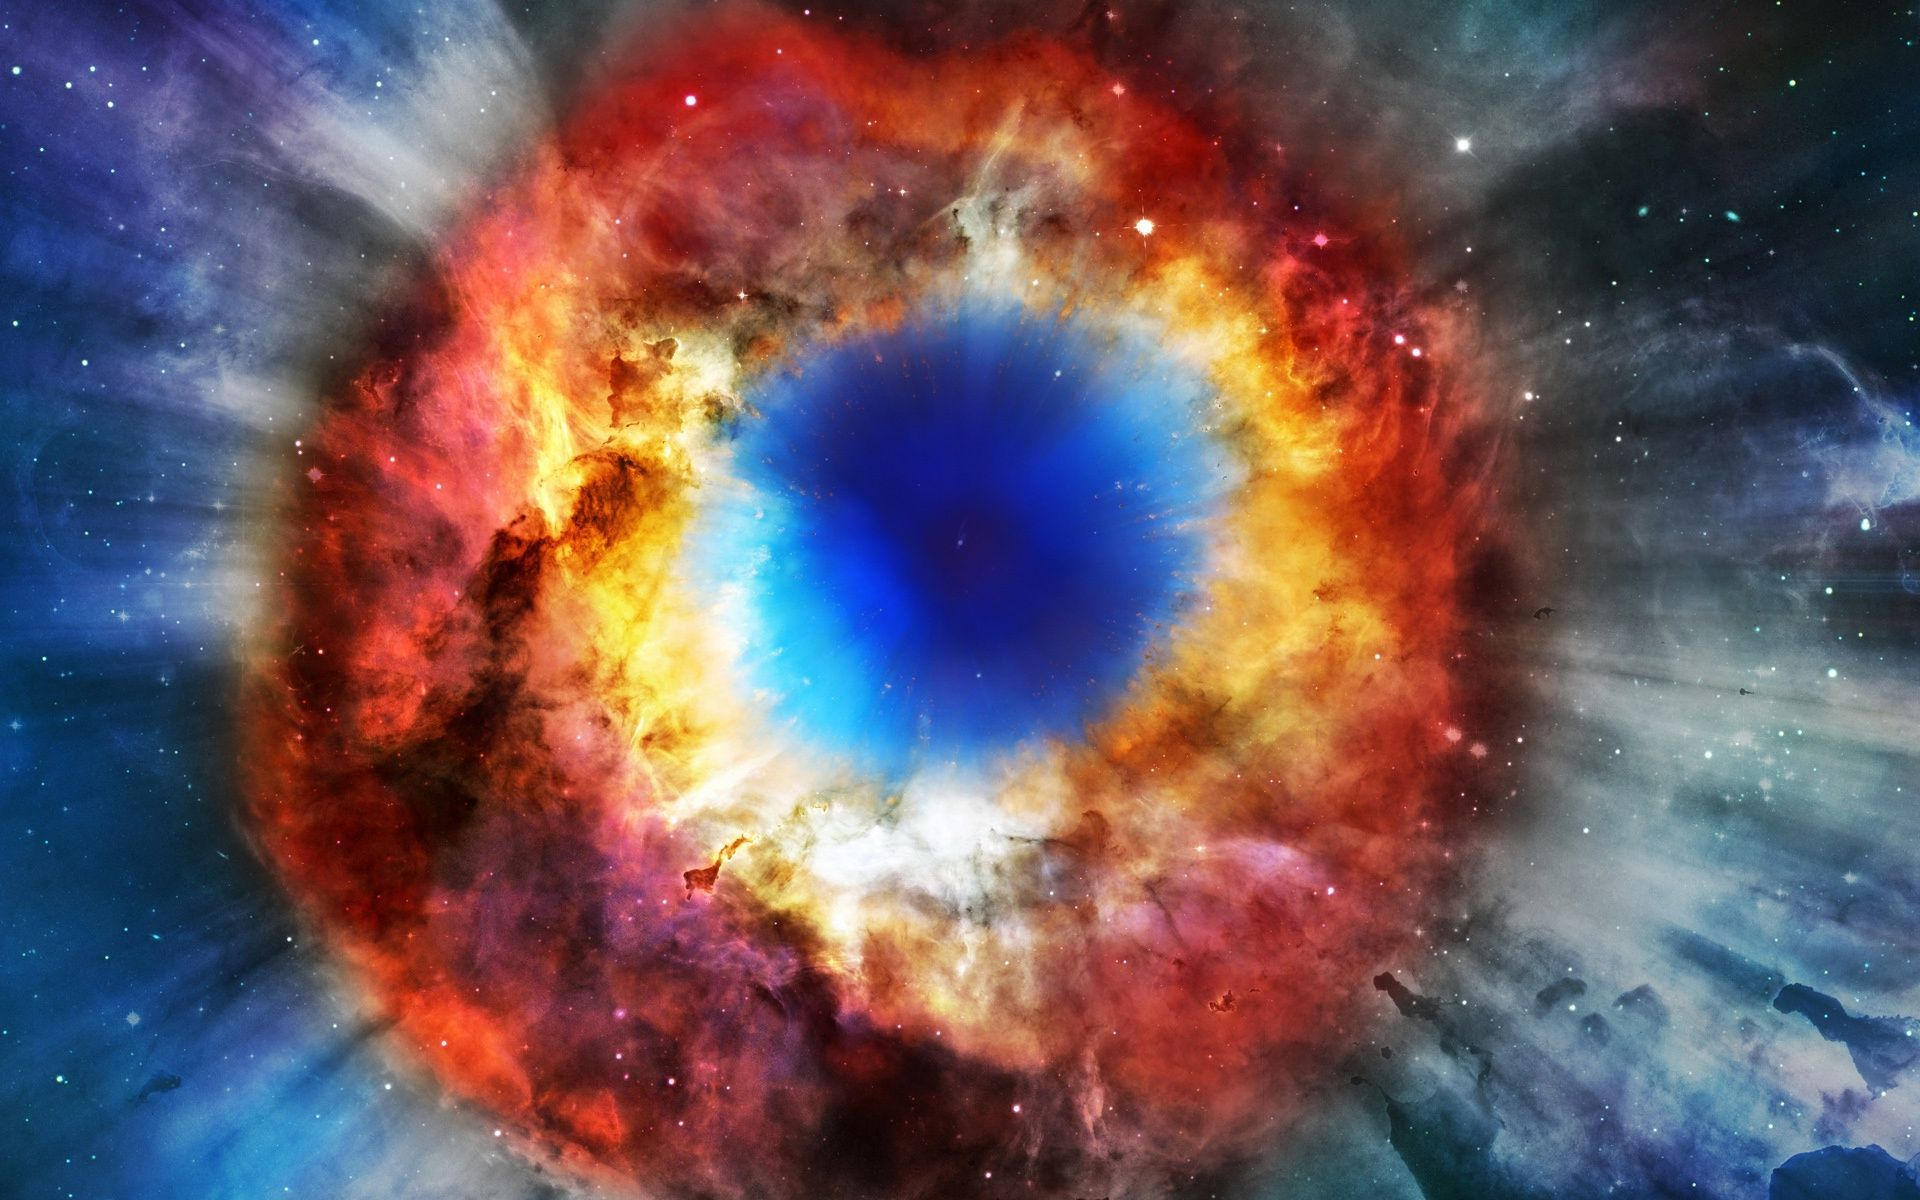 Supernova Supernova Explosion Wallpaper And Photo High Resolution Download Nebula Nebula Wallpaper Carina Nebula